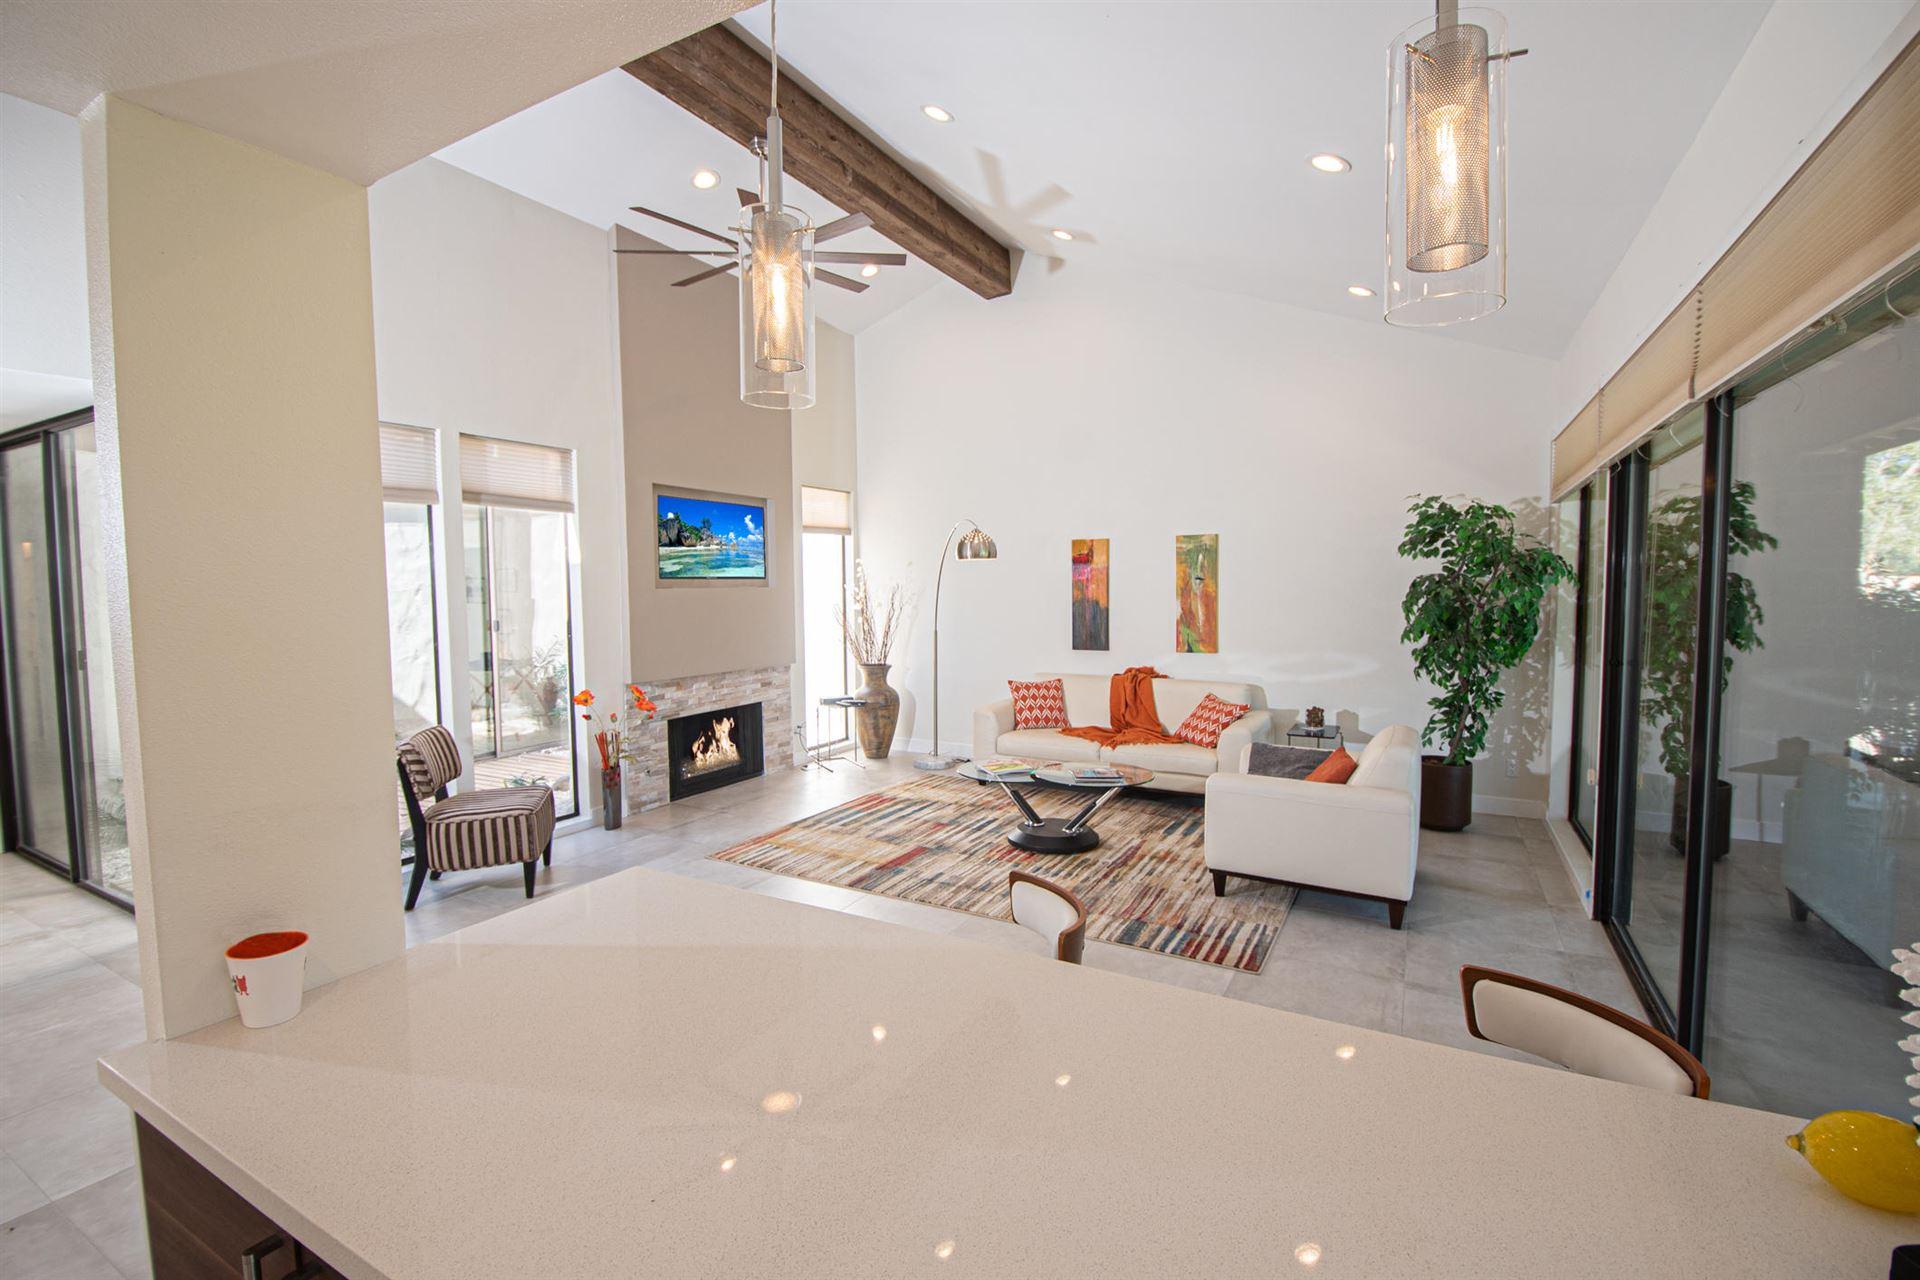 116 Castellana W. W, Palm Desert, CA 92260 - MLS#: 219039824